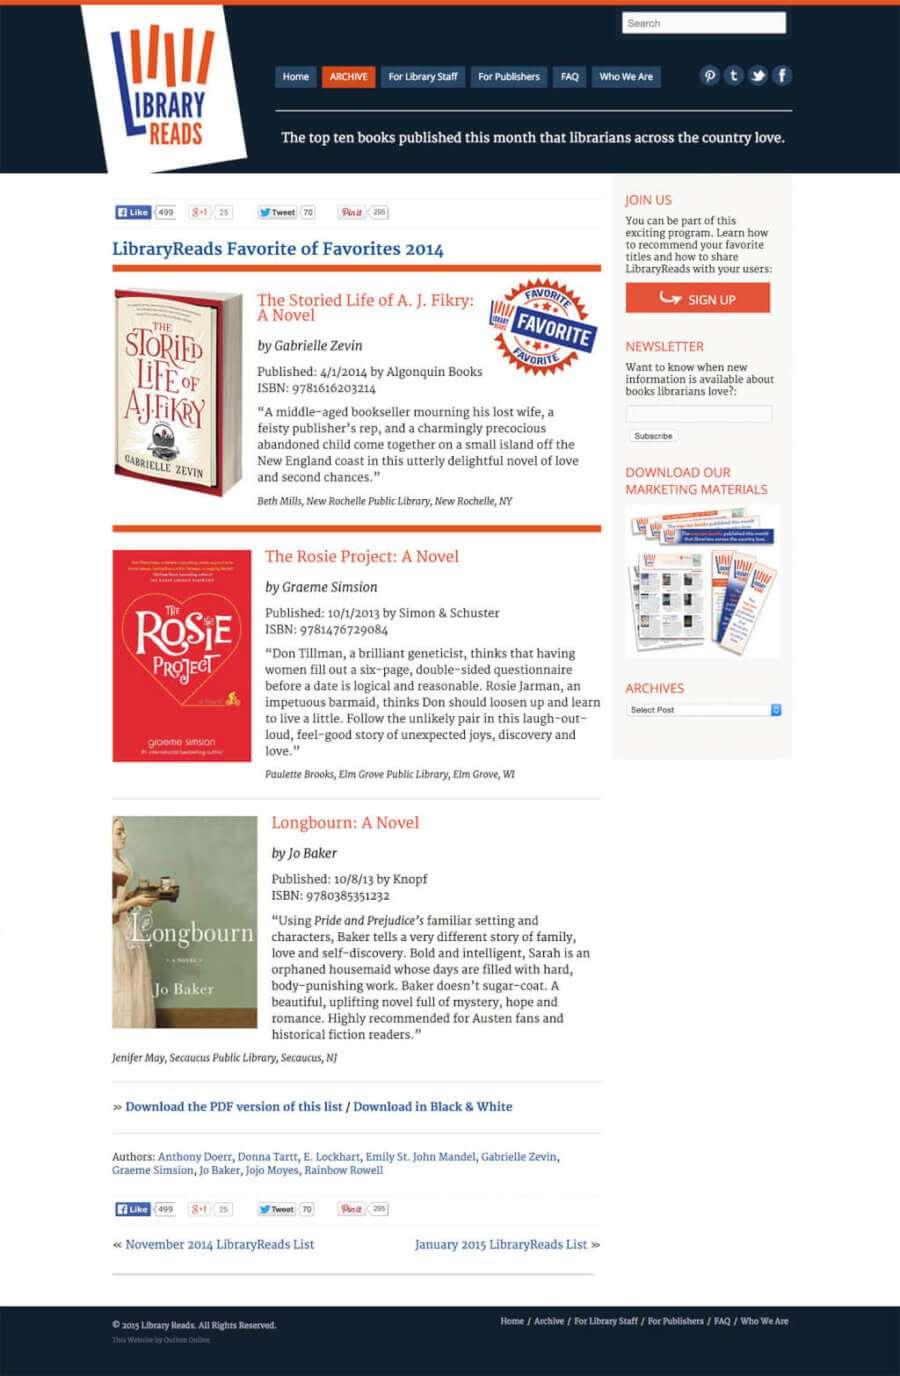 Library Website Design for LibraryReads